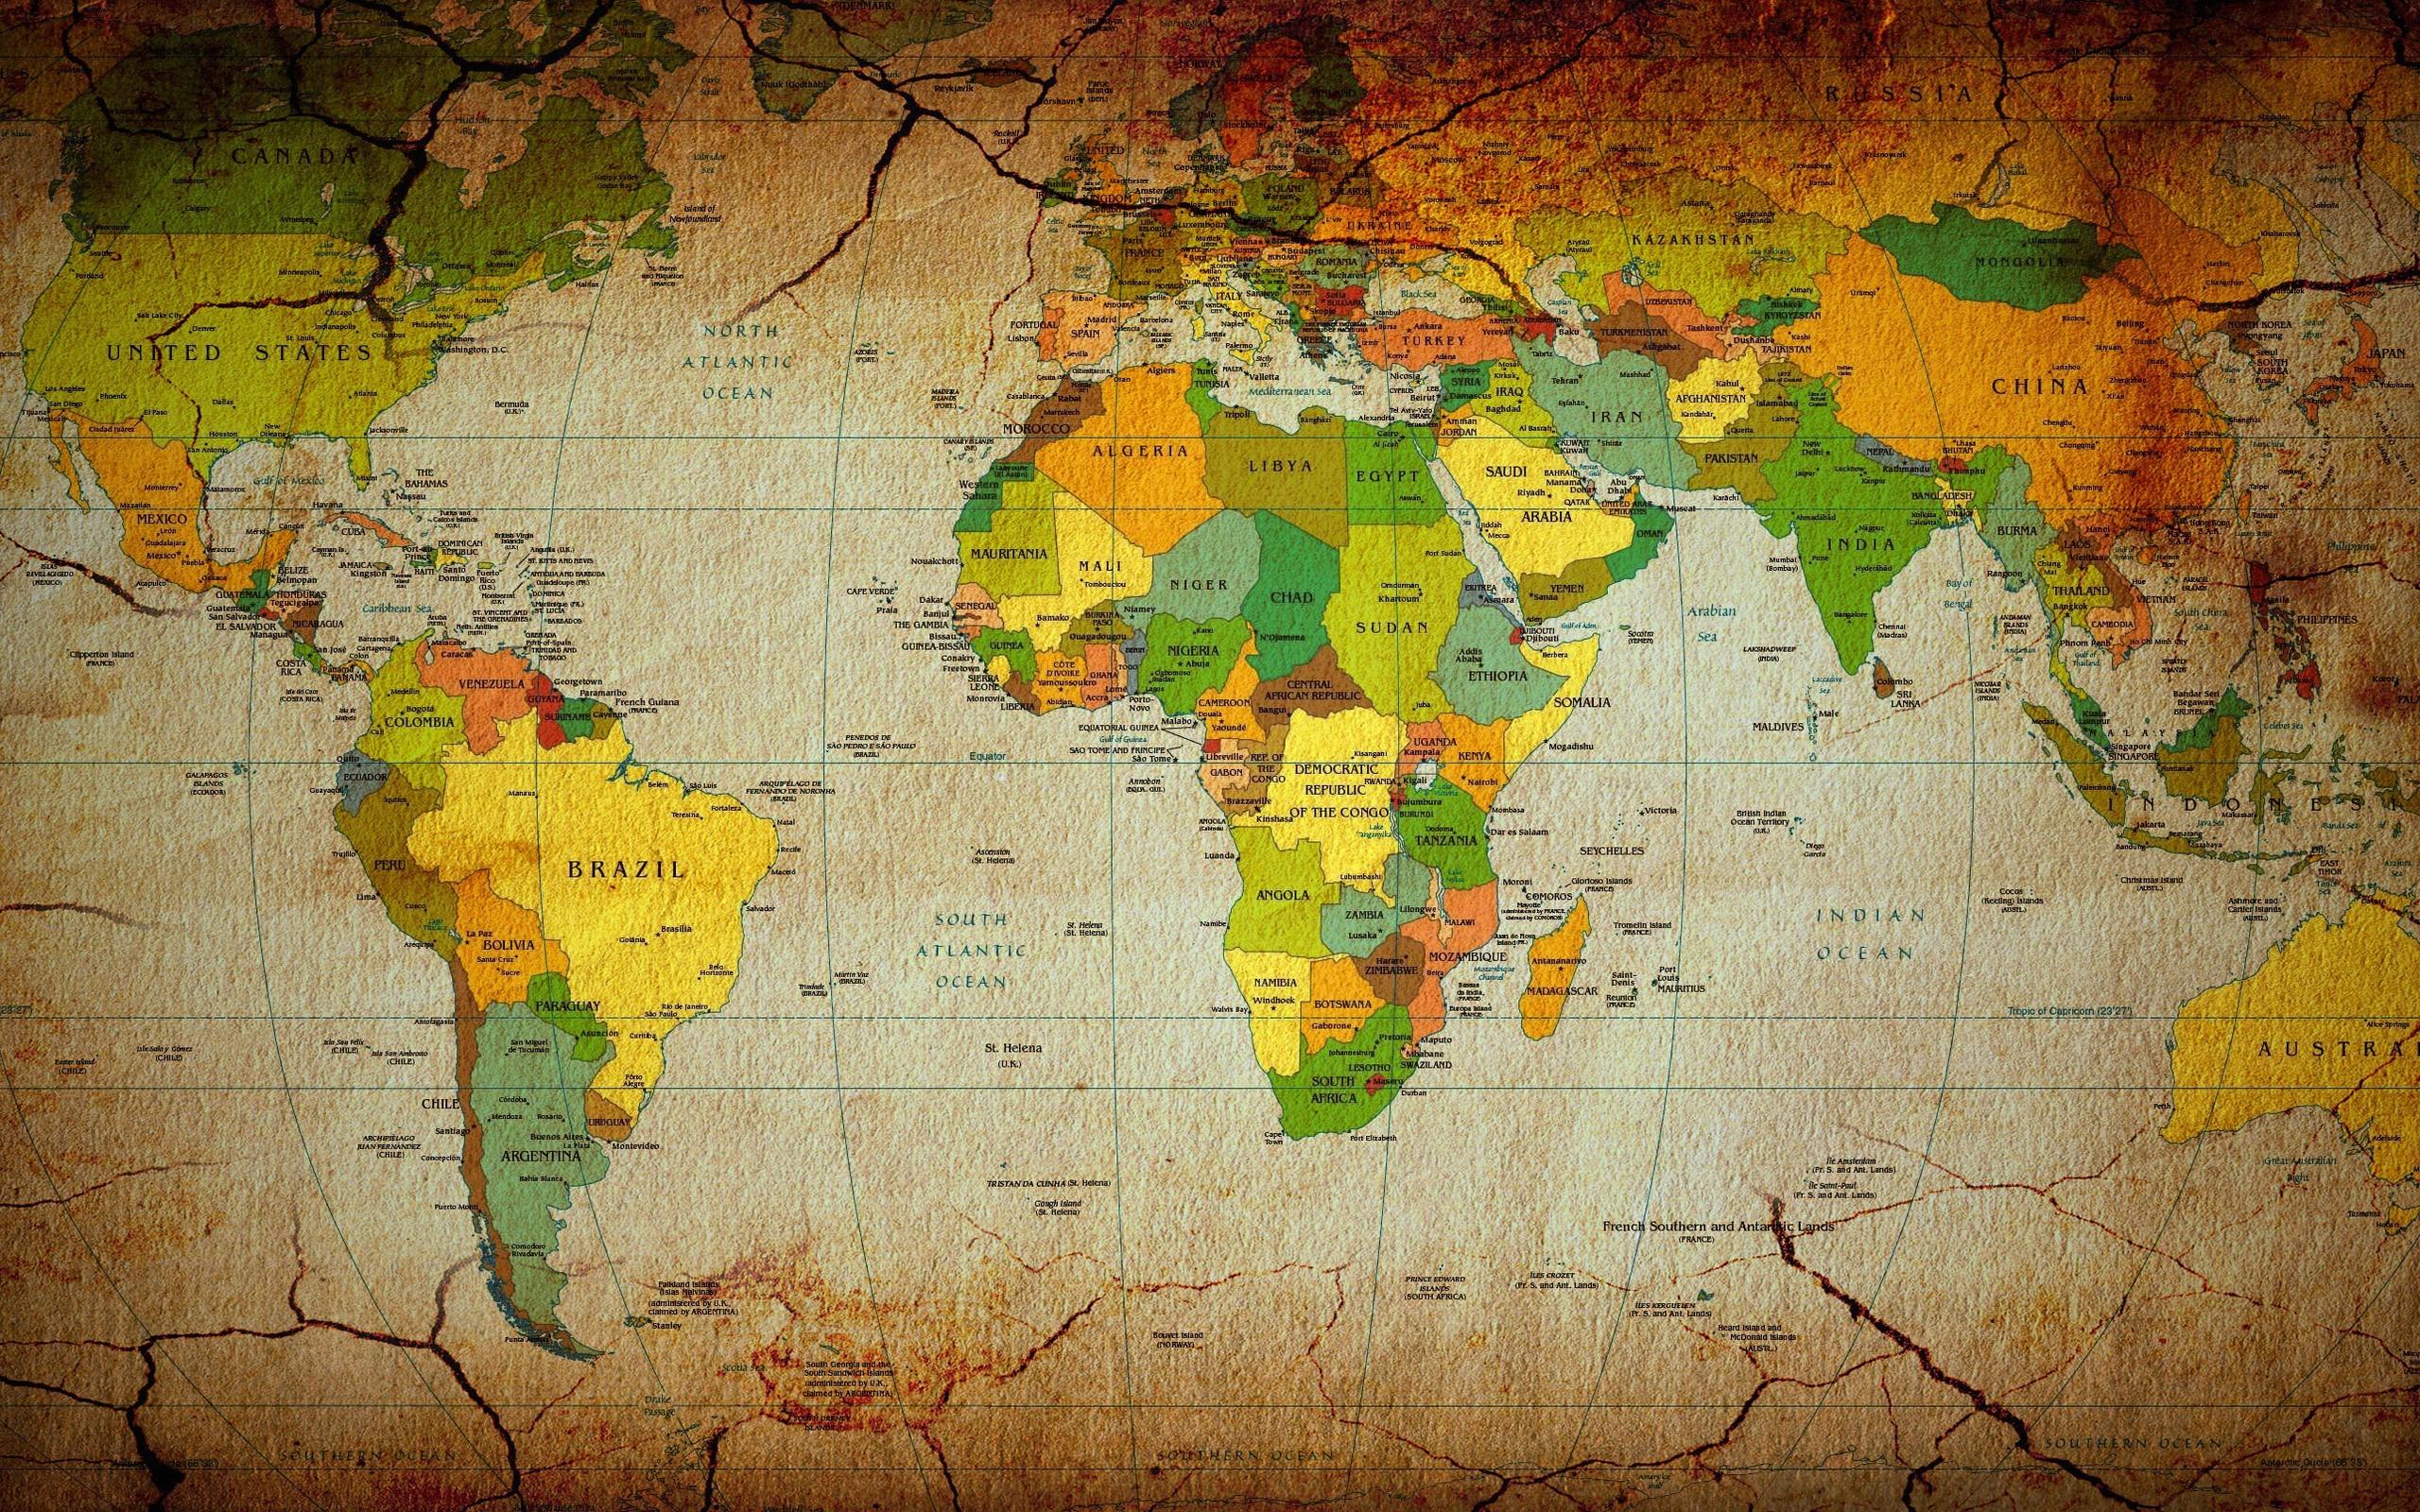 World map desktop wallpaper hd 70 images 2560x1600 world map wallpaper 6254 gumiabroncs Images